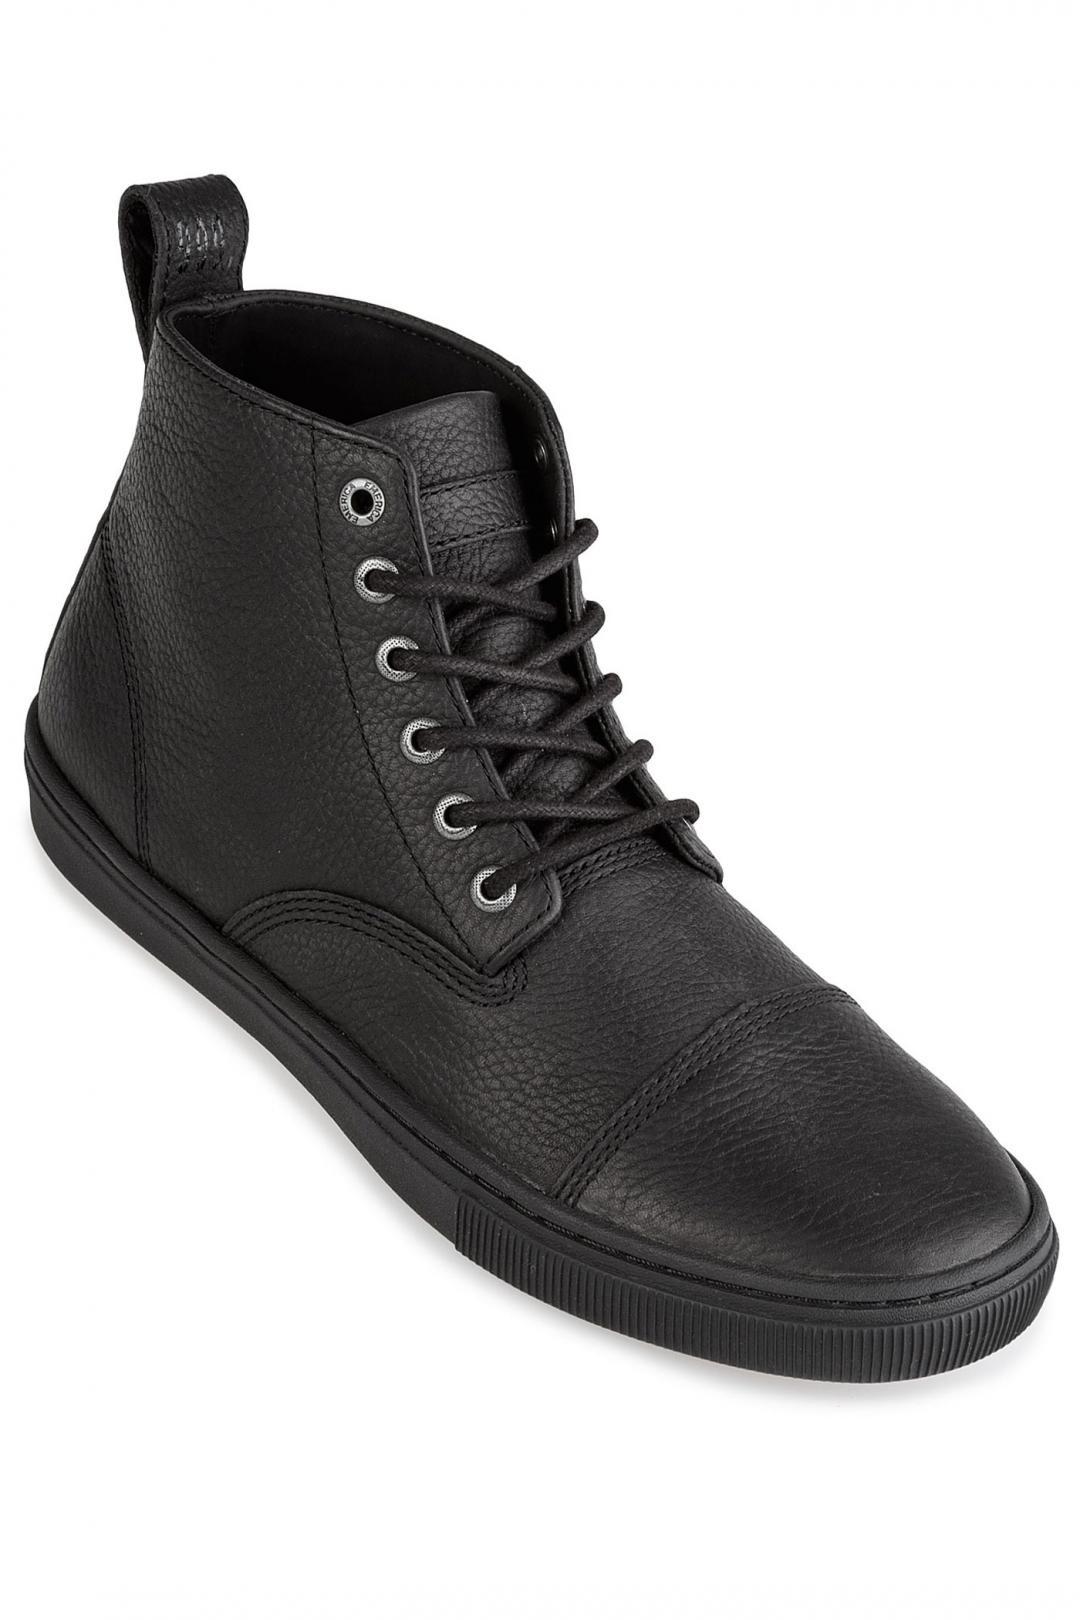 Uomo Emerica Shifter High x Reserve black black gum | Sneaker